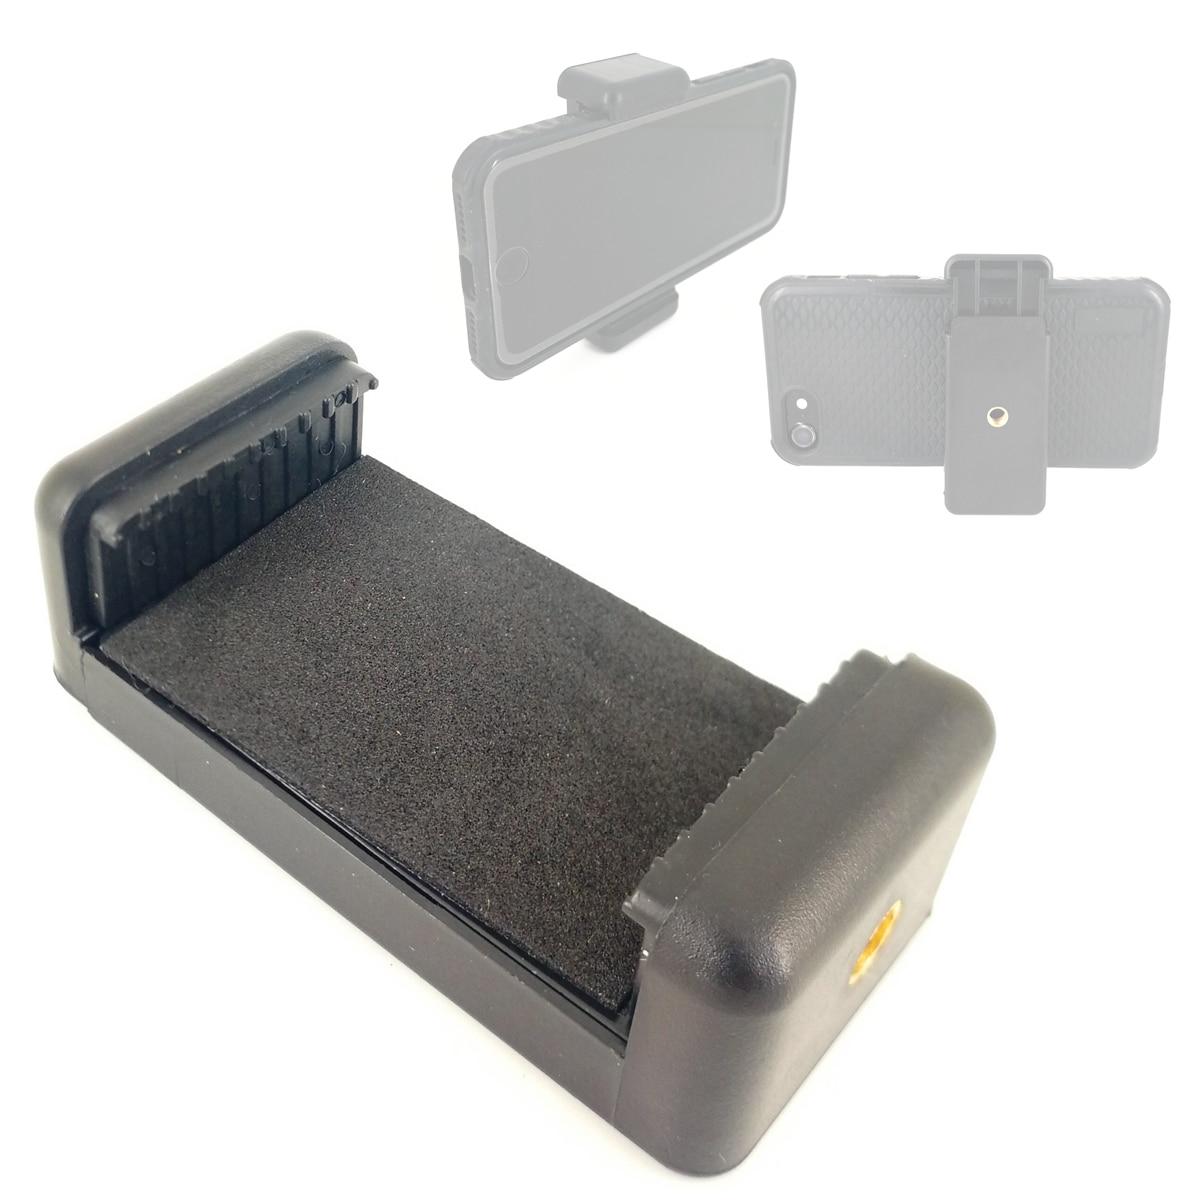 Adjustable Mobile Cell Phone Clamp Clip Holder Bracket Adapter for 5.5-8.3cm Smartphone Tripod Tiktok Youtube Livestream